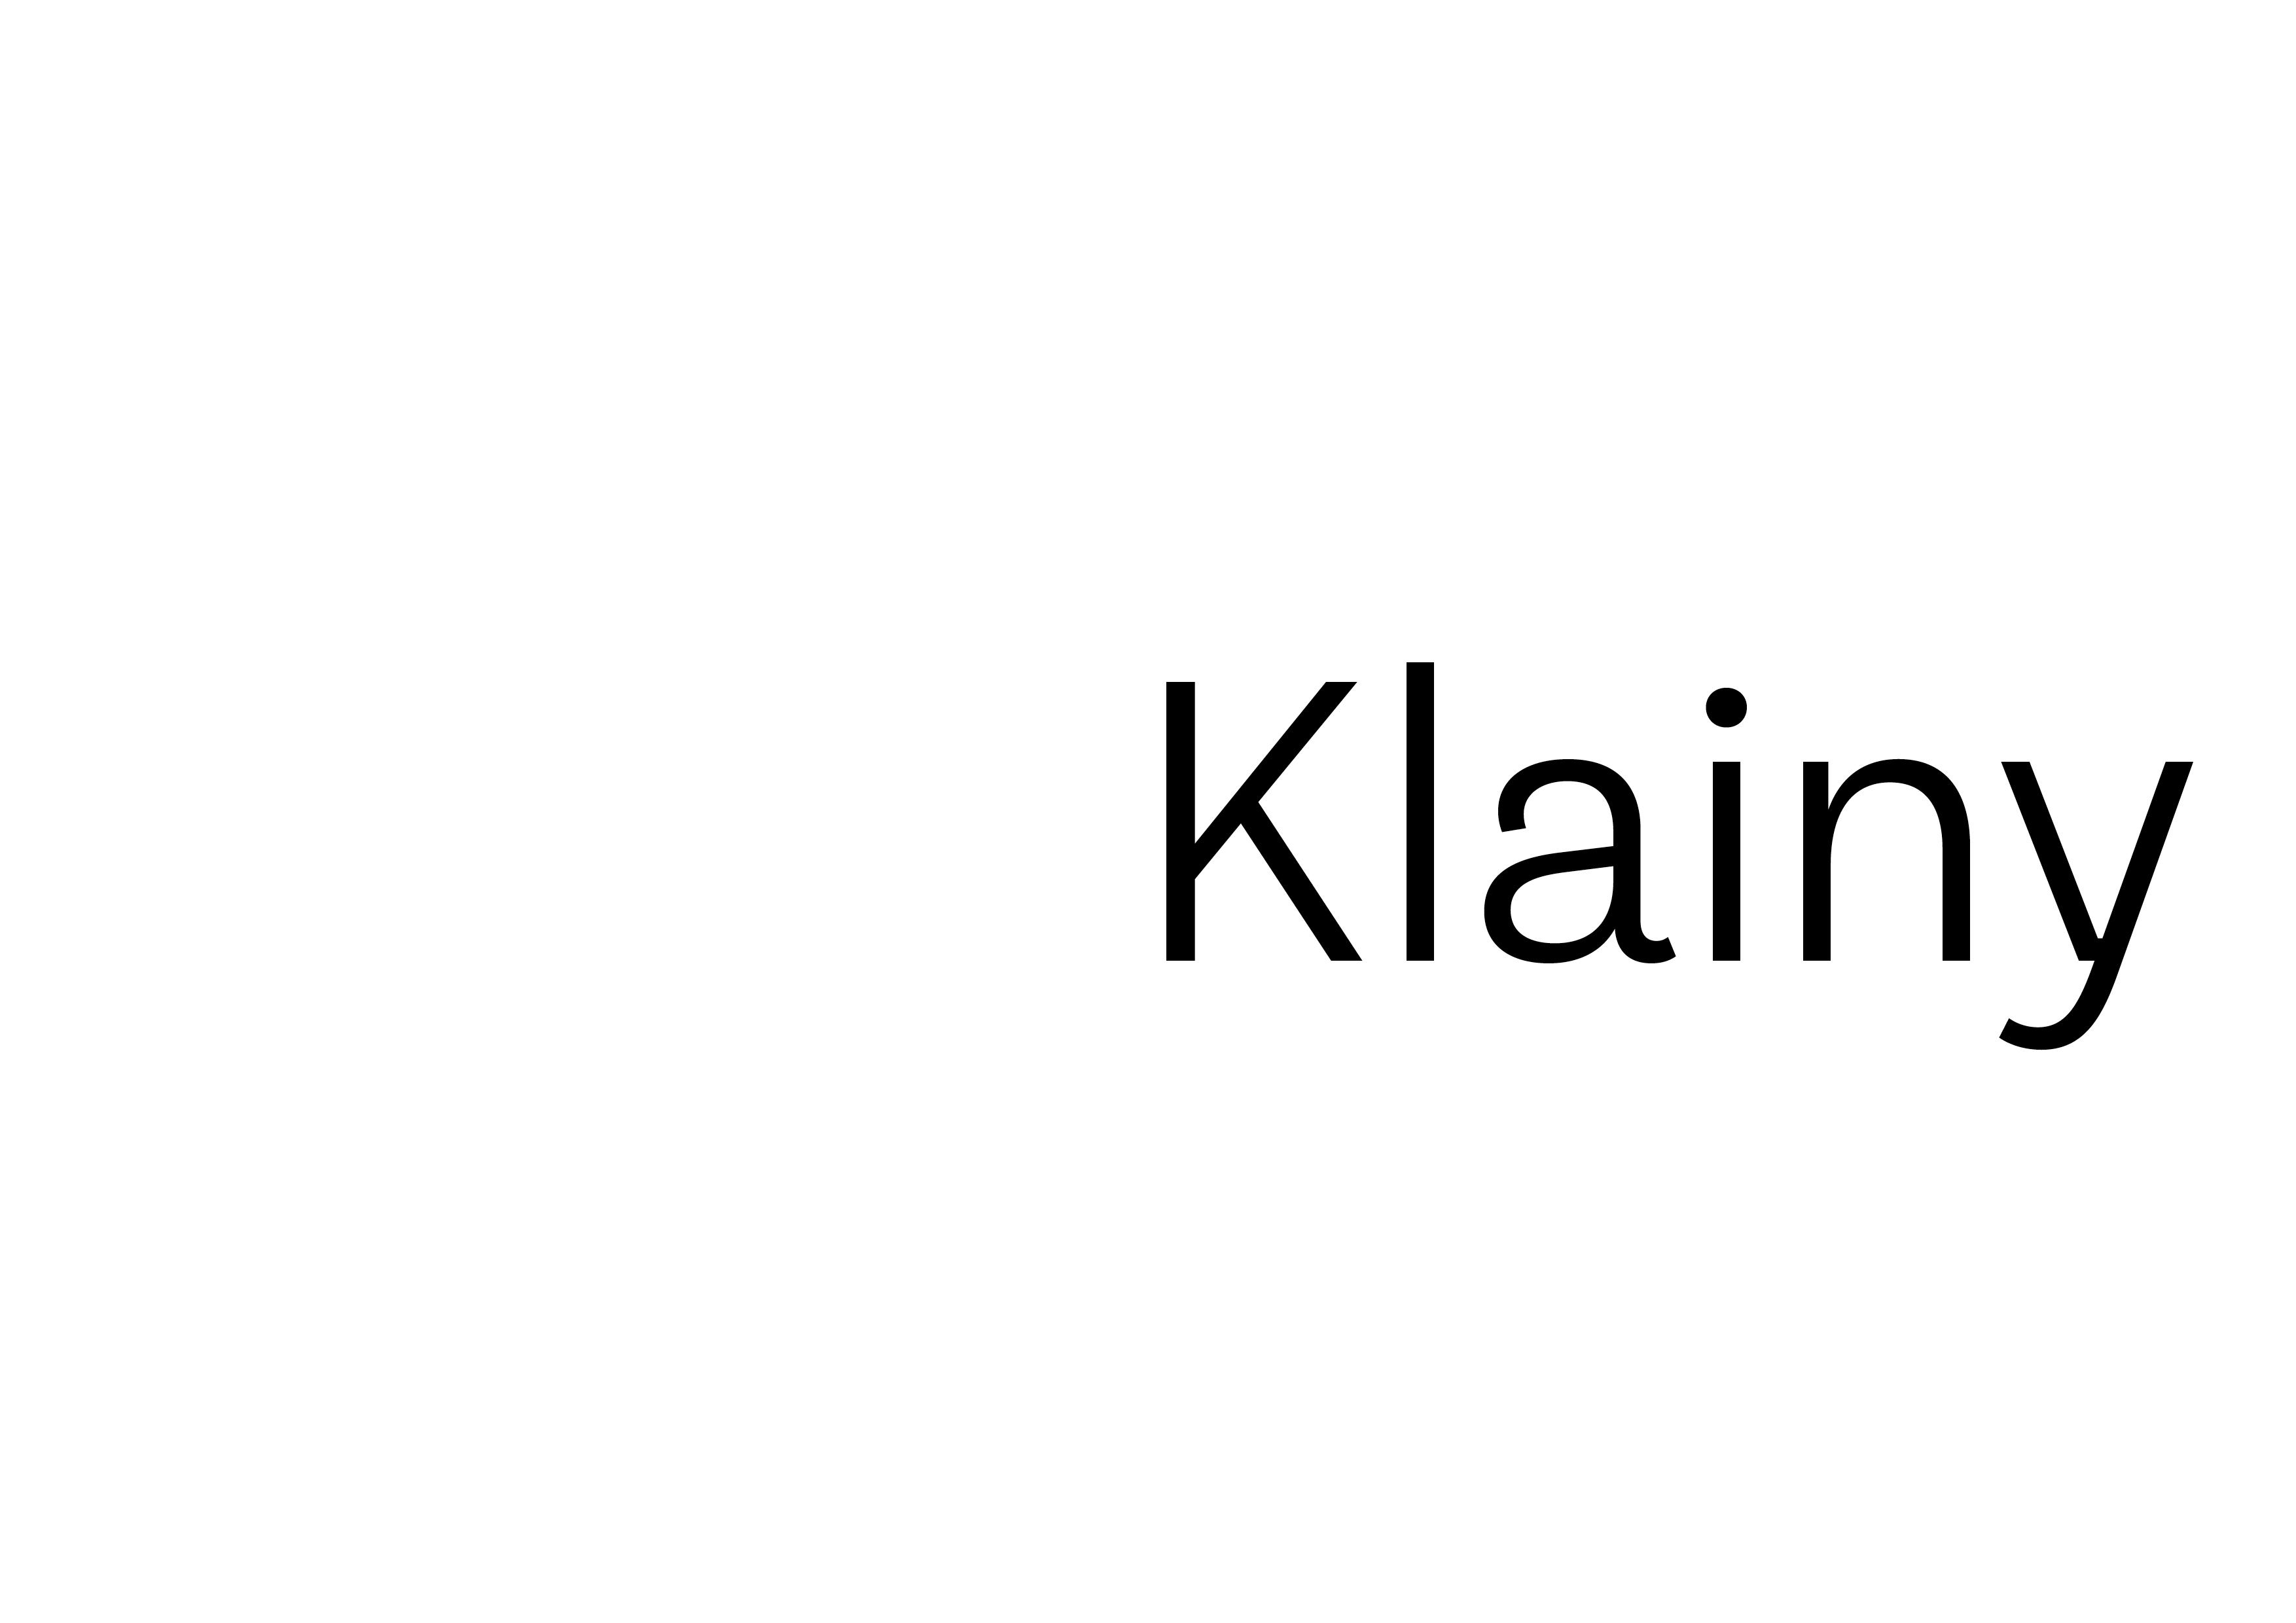 Klainy - Identity Letters